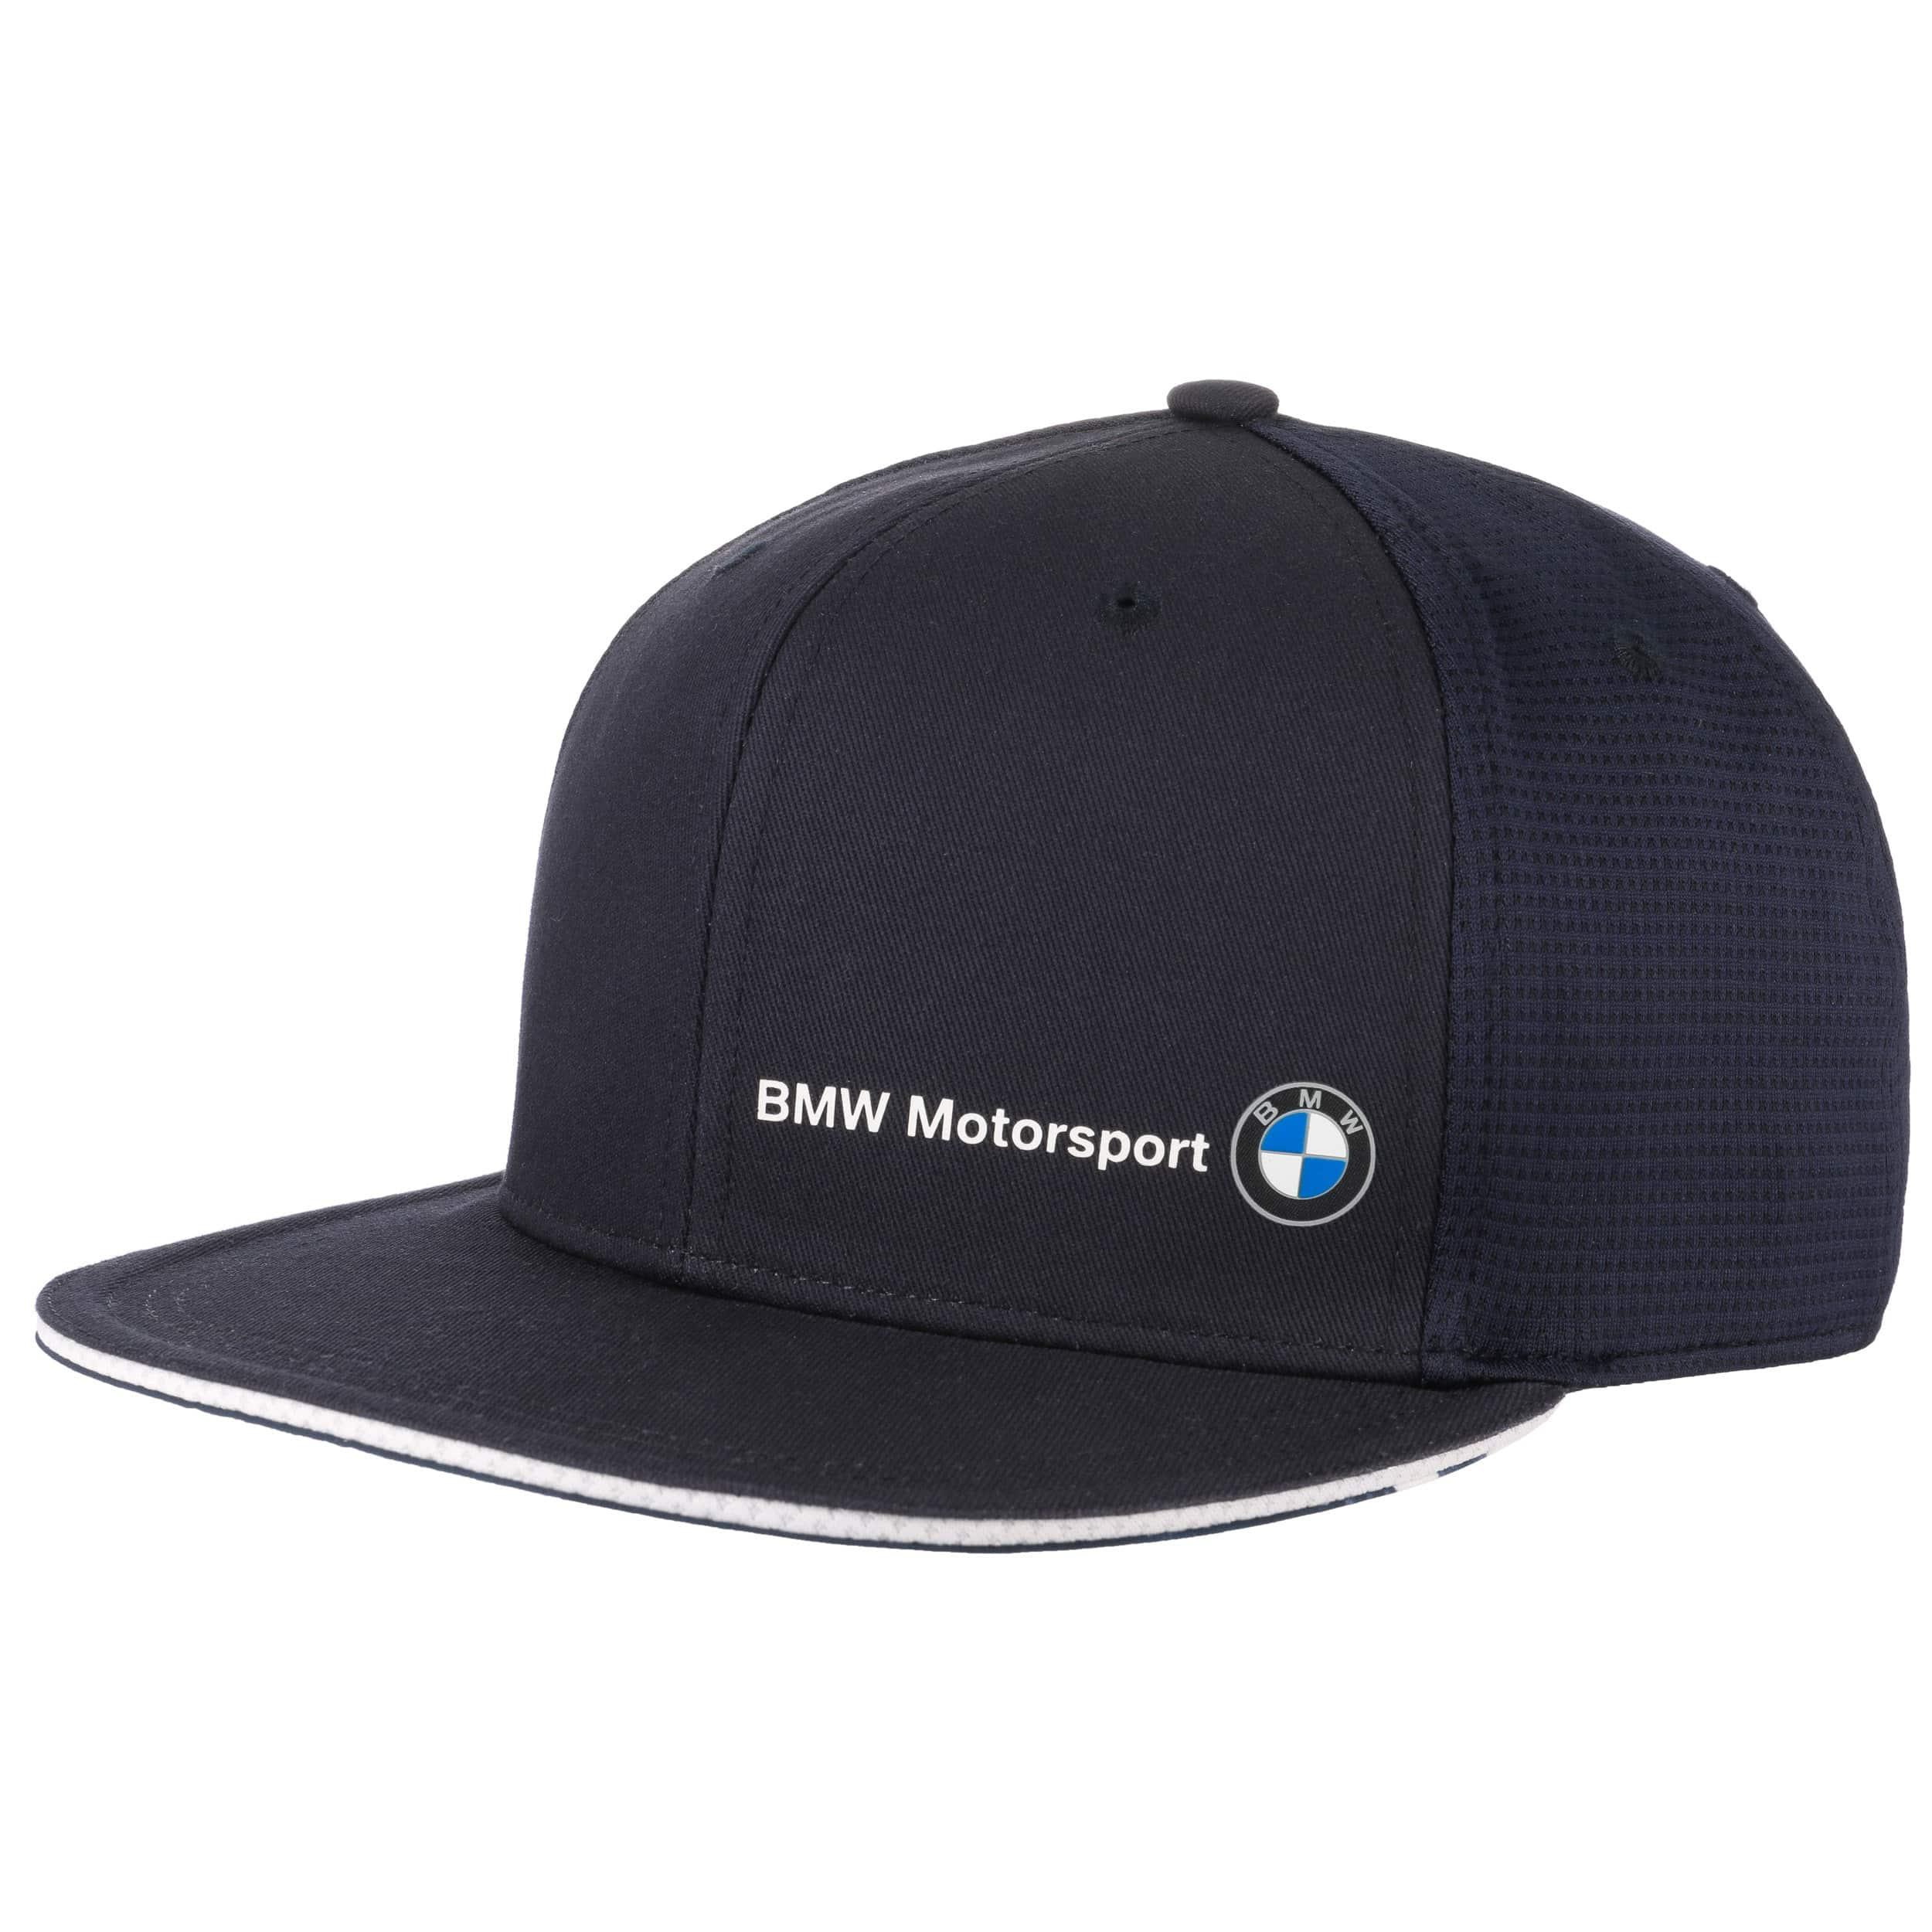 ... wholesale bmw motorsport flat brim cap by puma navy 6 b1b82 0c864 10eaaaaf52ec